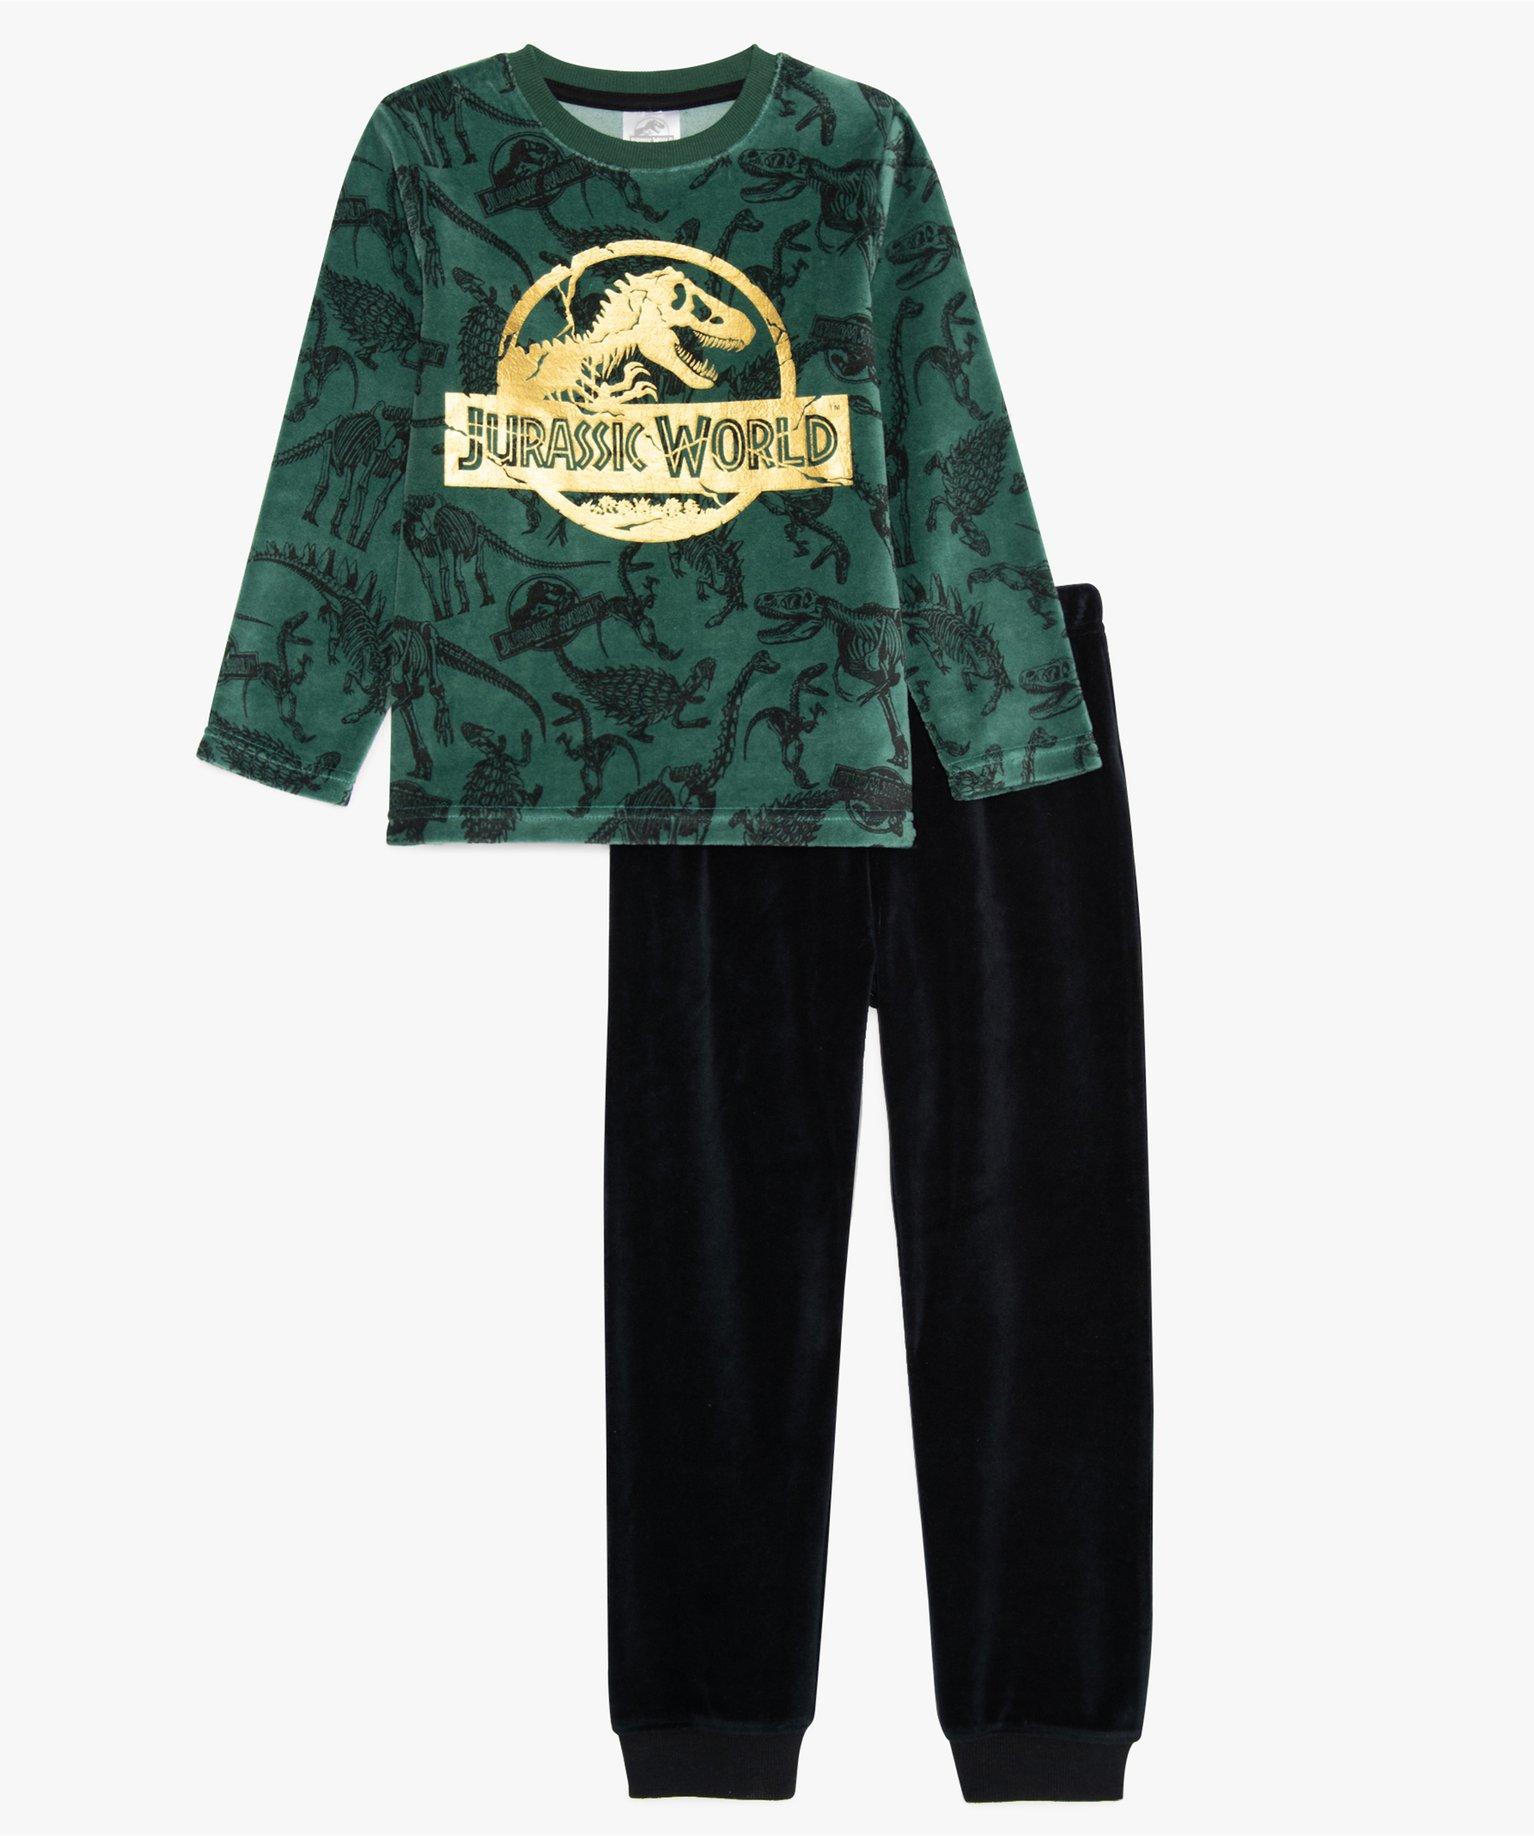 Pyjama garçon en velours avec motif dinosaure – Jurassic World